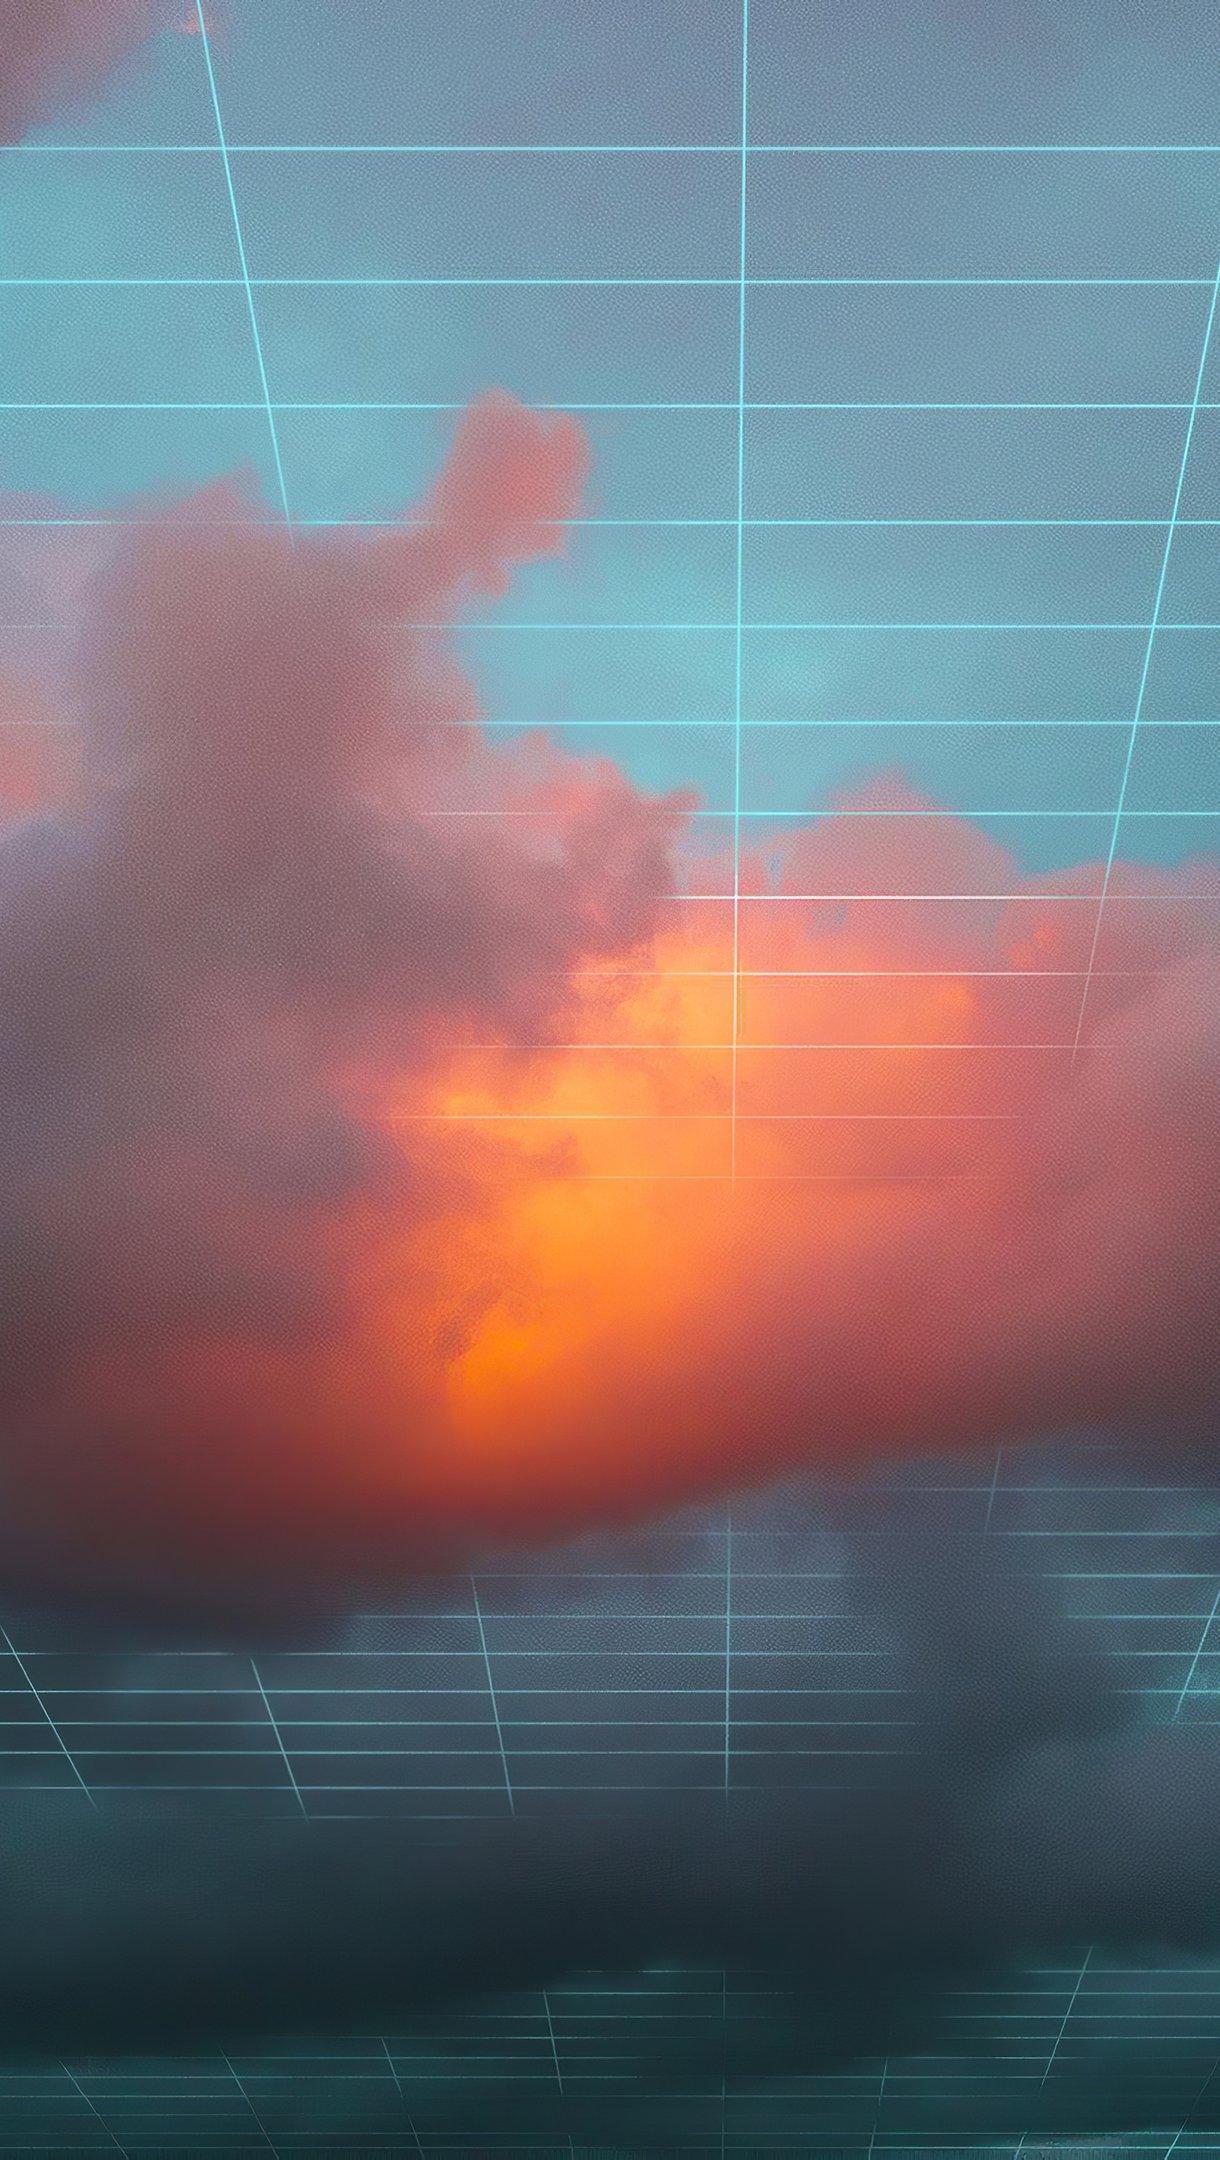 Fondos de pantalla Nubes digitales Vertical